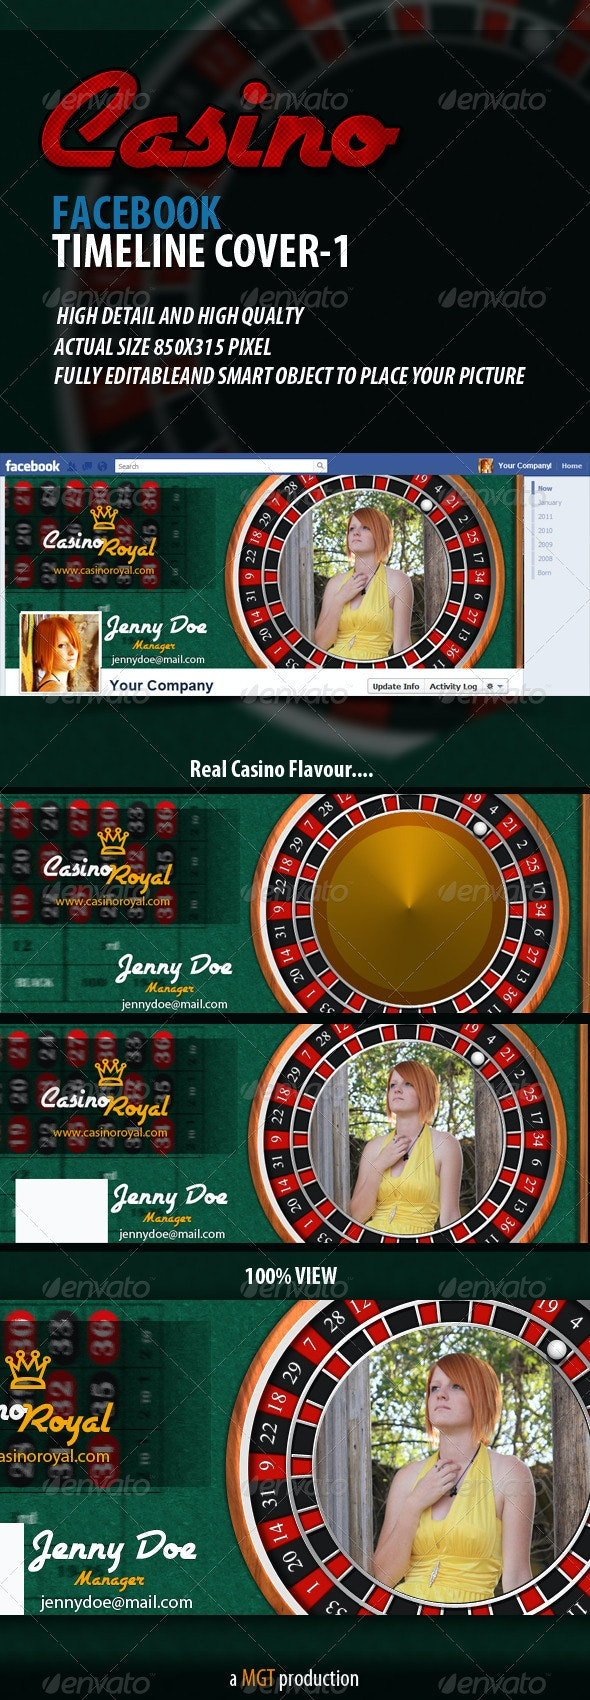 Casino Facebook Timeline Cover - 1 - Facebook Timeline Covers Social Media